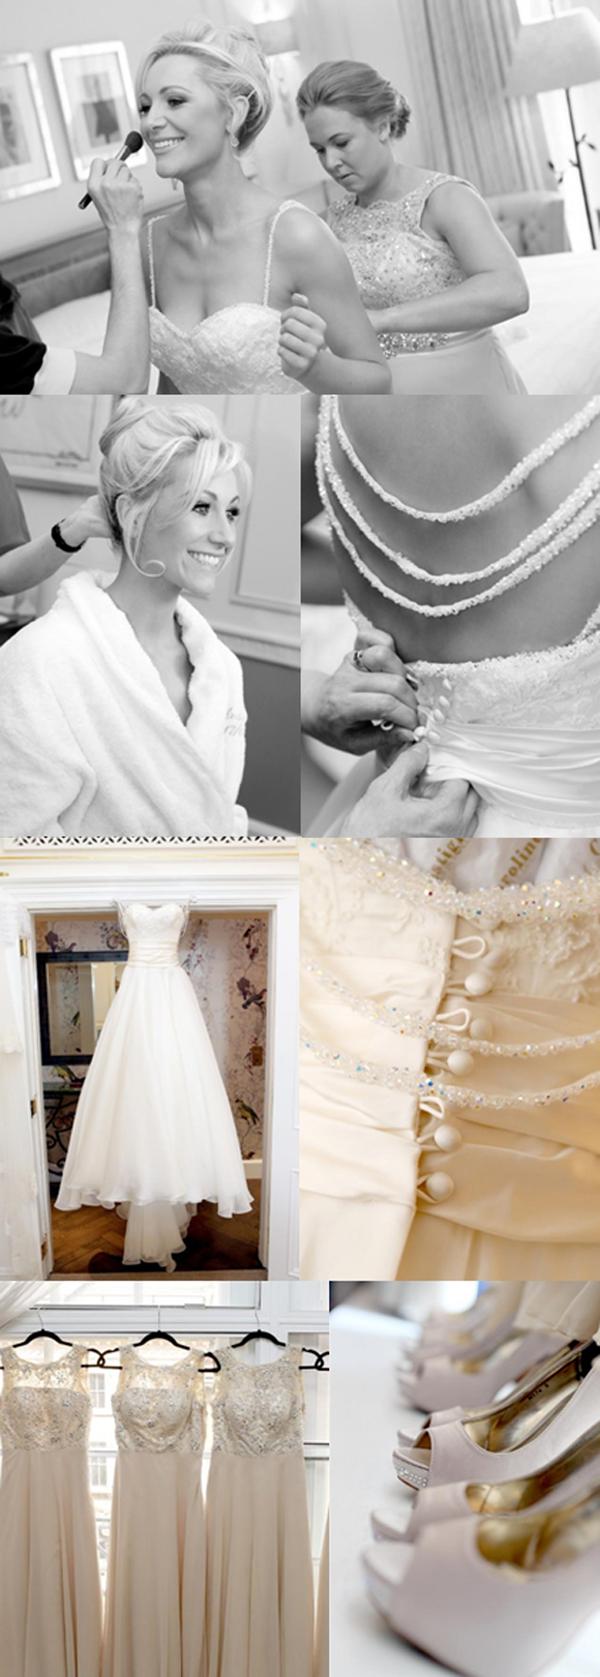 Sarah Stone Wedding 1